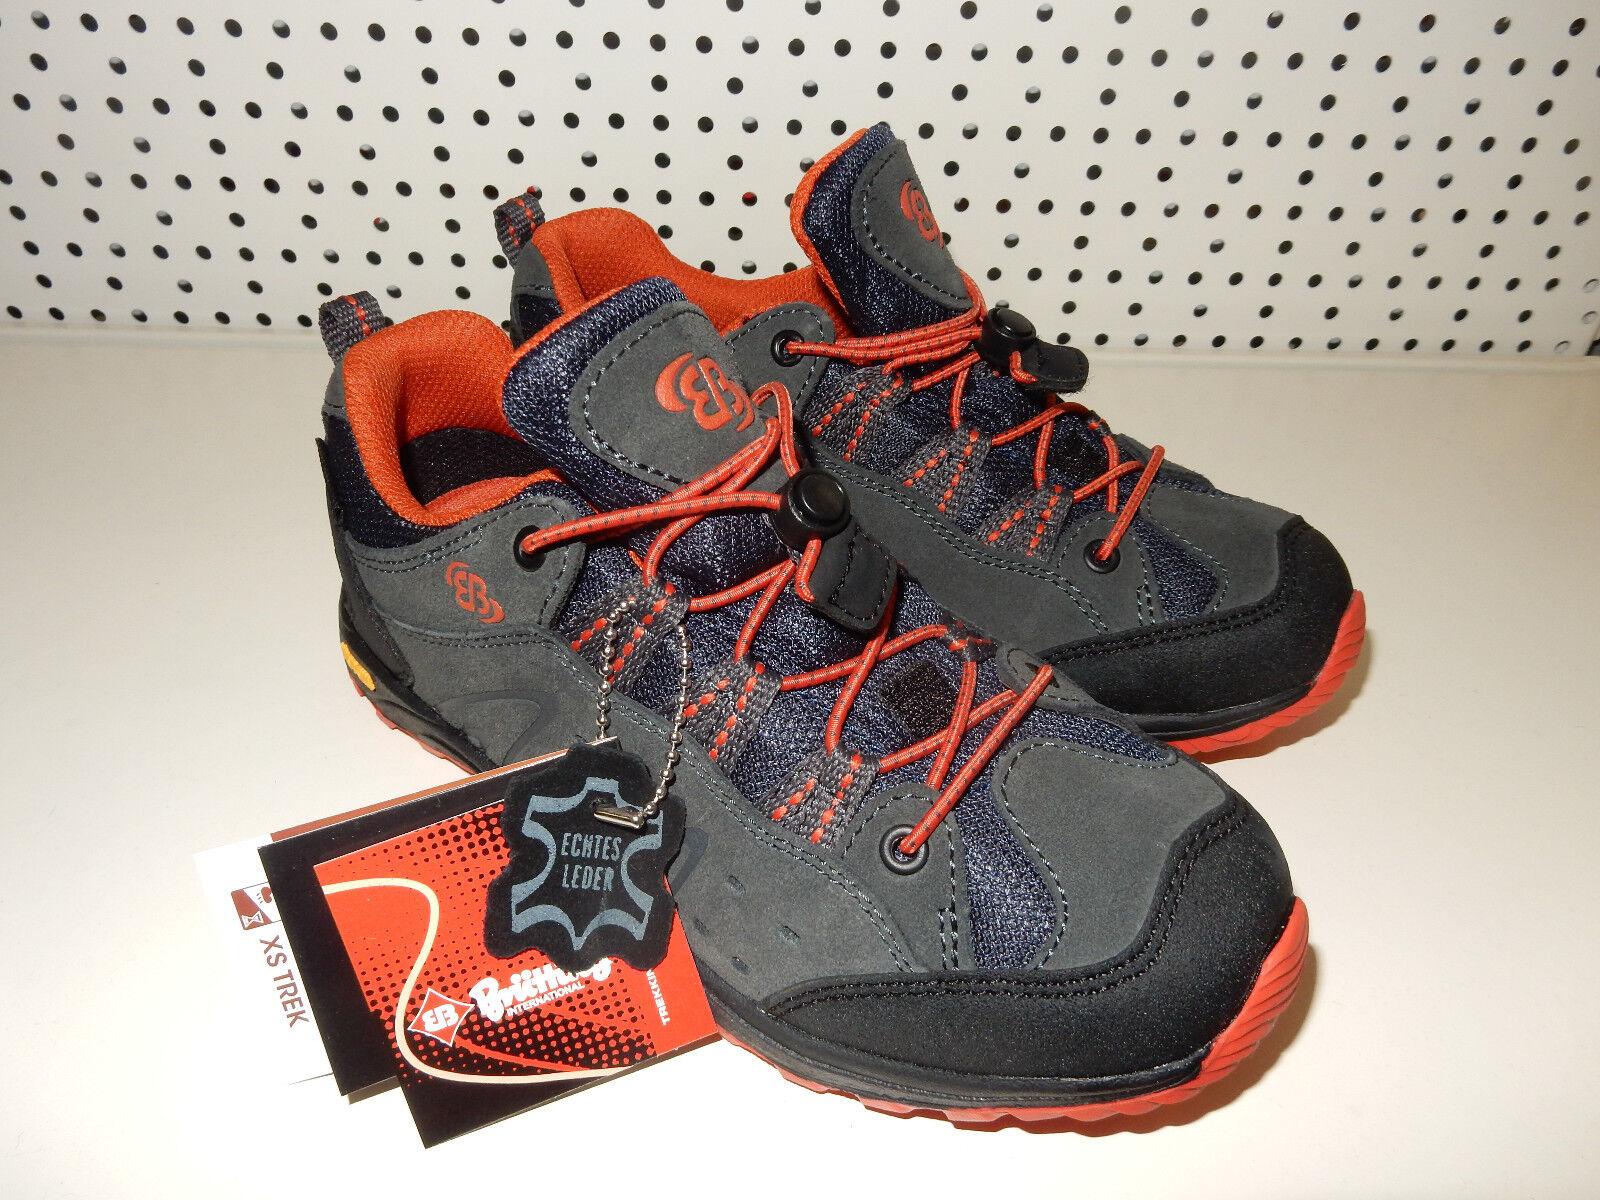 Brütting Mount Bona Low Trekking-& Wanderstiefel Schuhe Schuhe Schuhe Gr. 31 Anthrazit Orange  | Outlet Store  700cd5